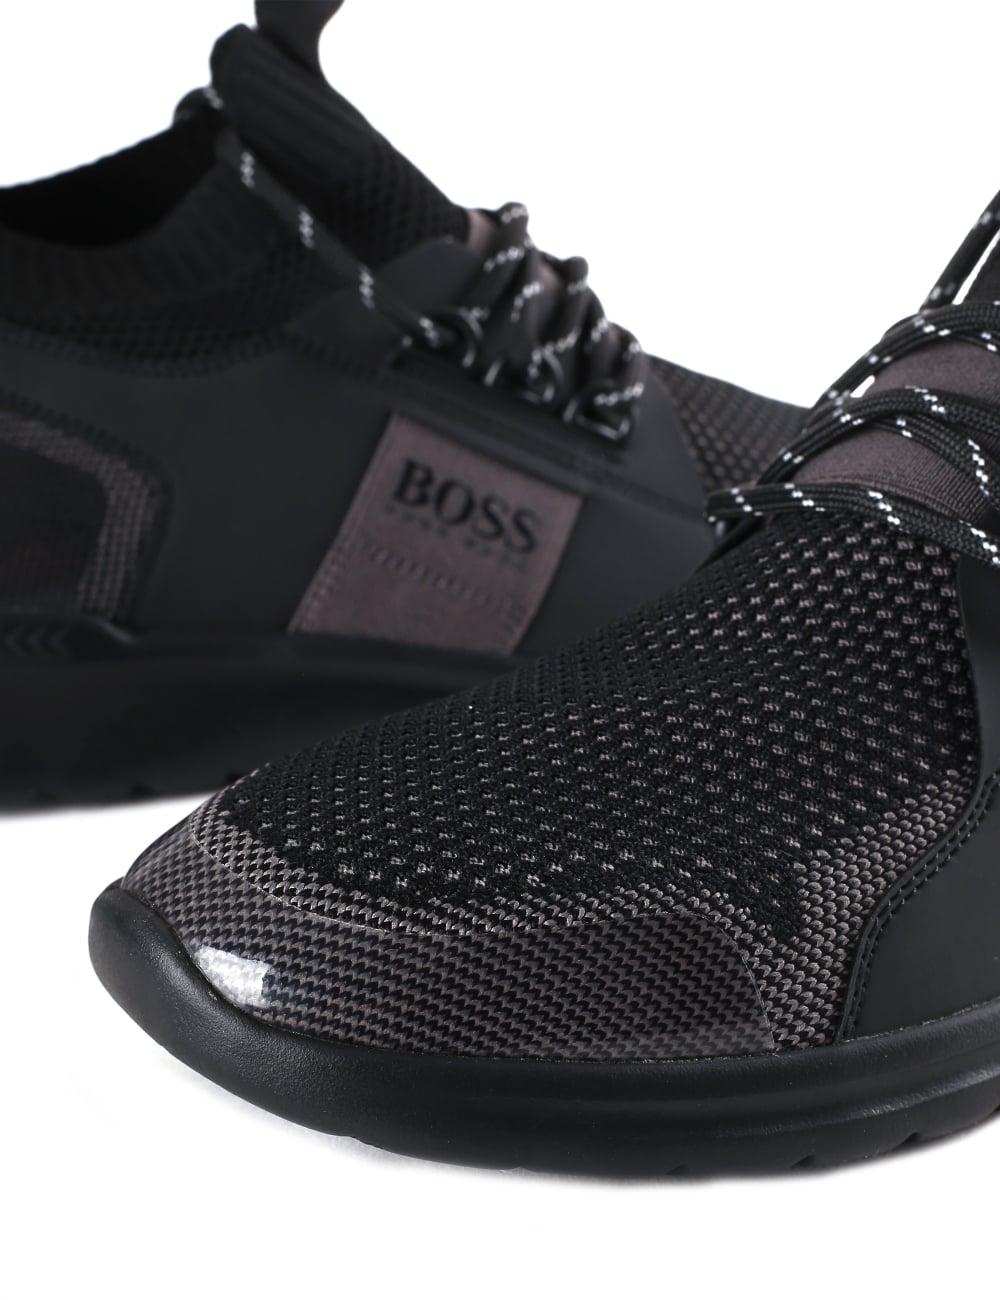 8fed9d37a845ac Boss Green Extreme Runn Men s Knit Trainer